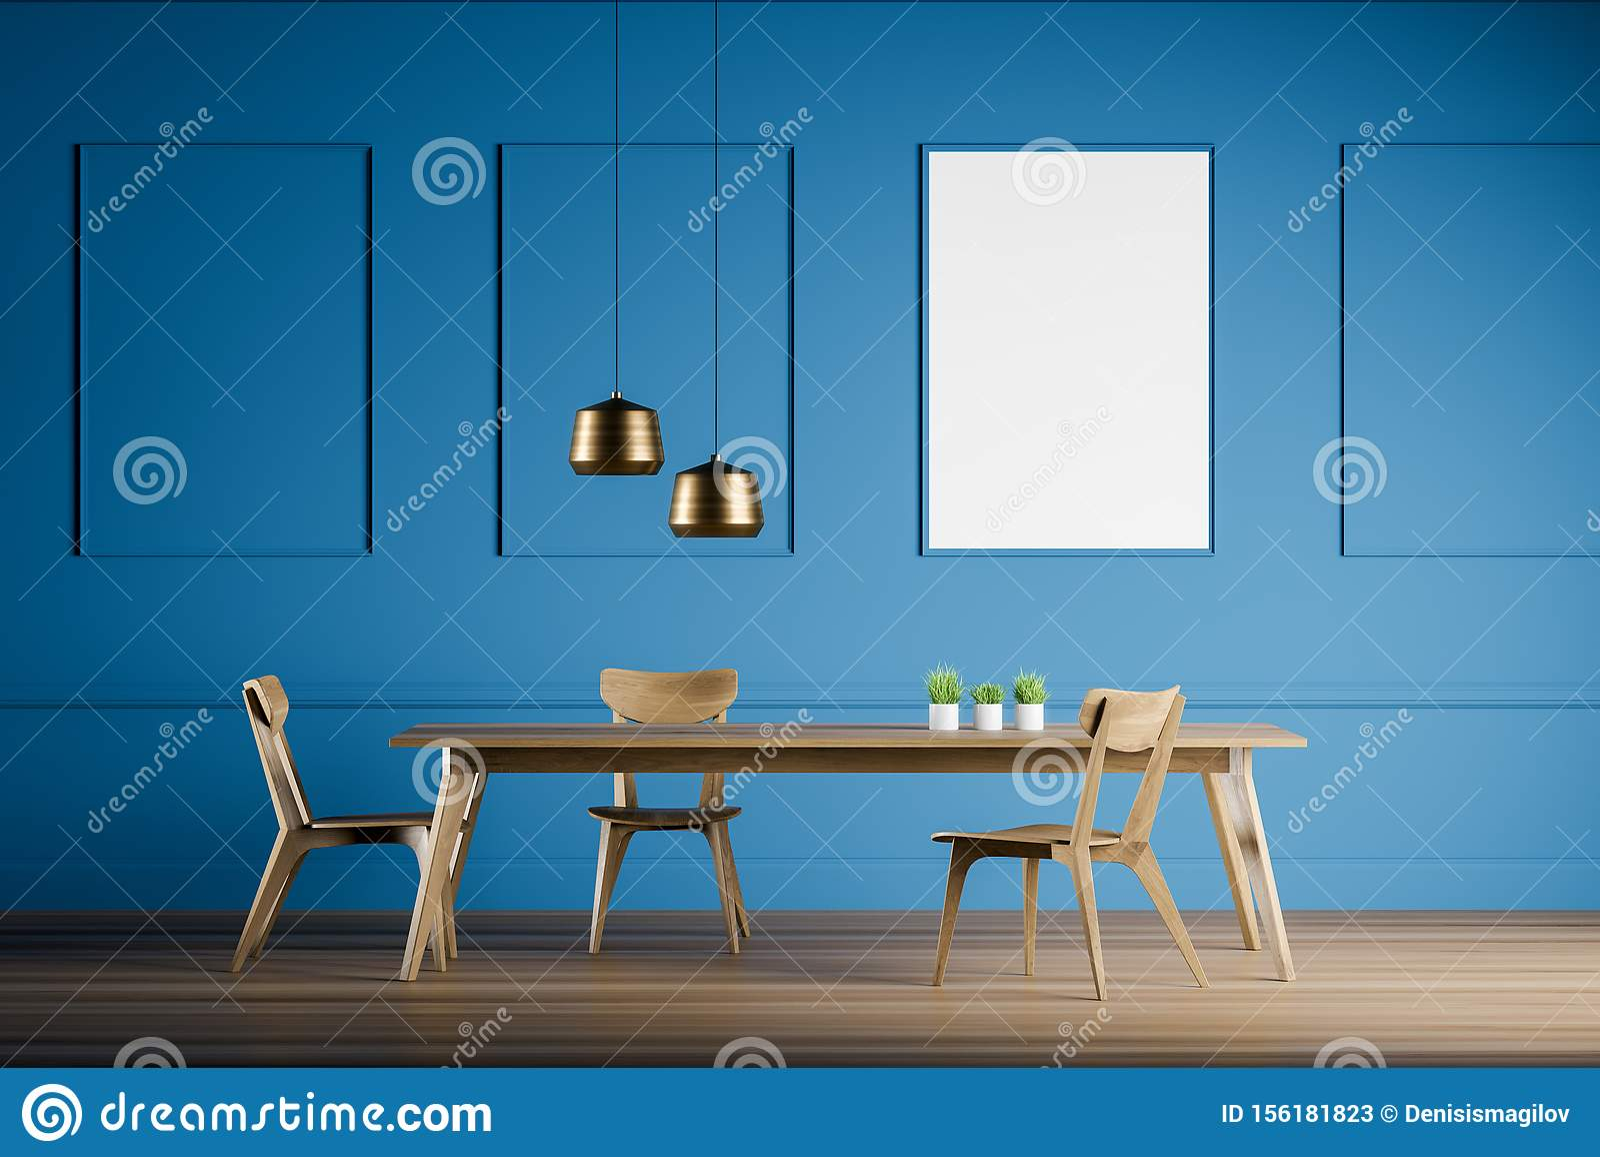 Blue Dining Room Interior With Poster Stock Illustration Illustration Of Minimalism Empty 156181823